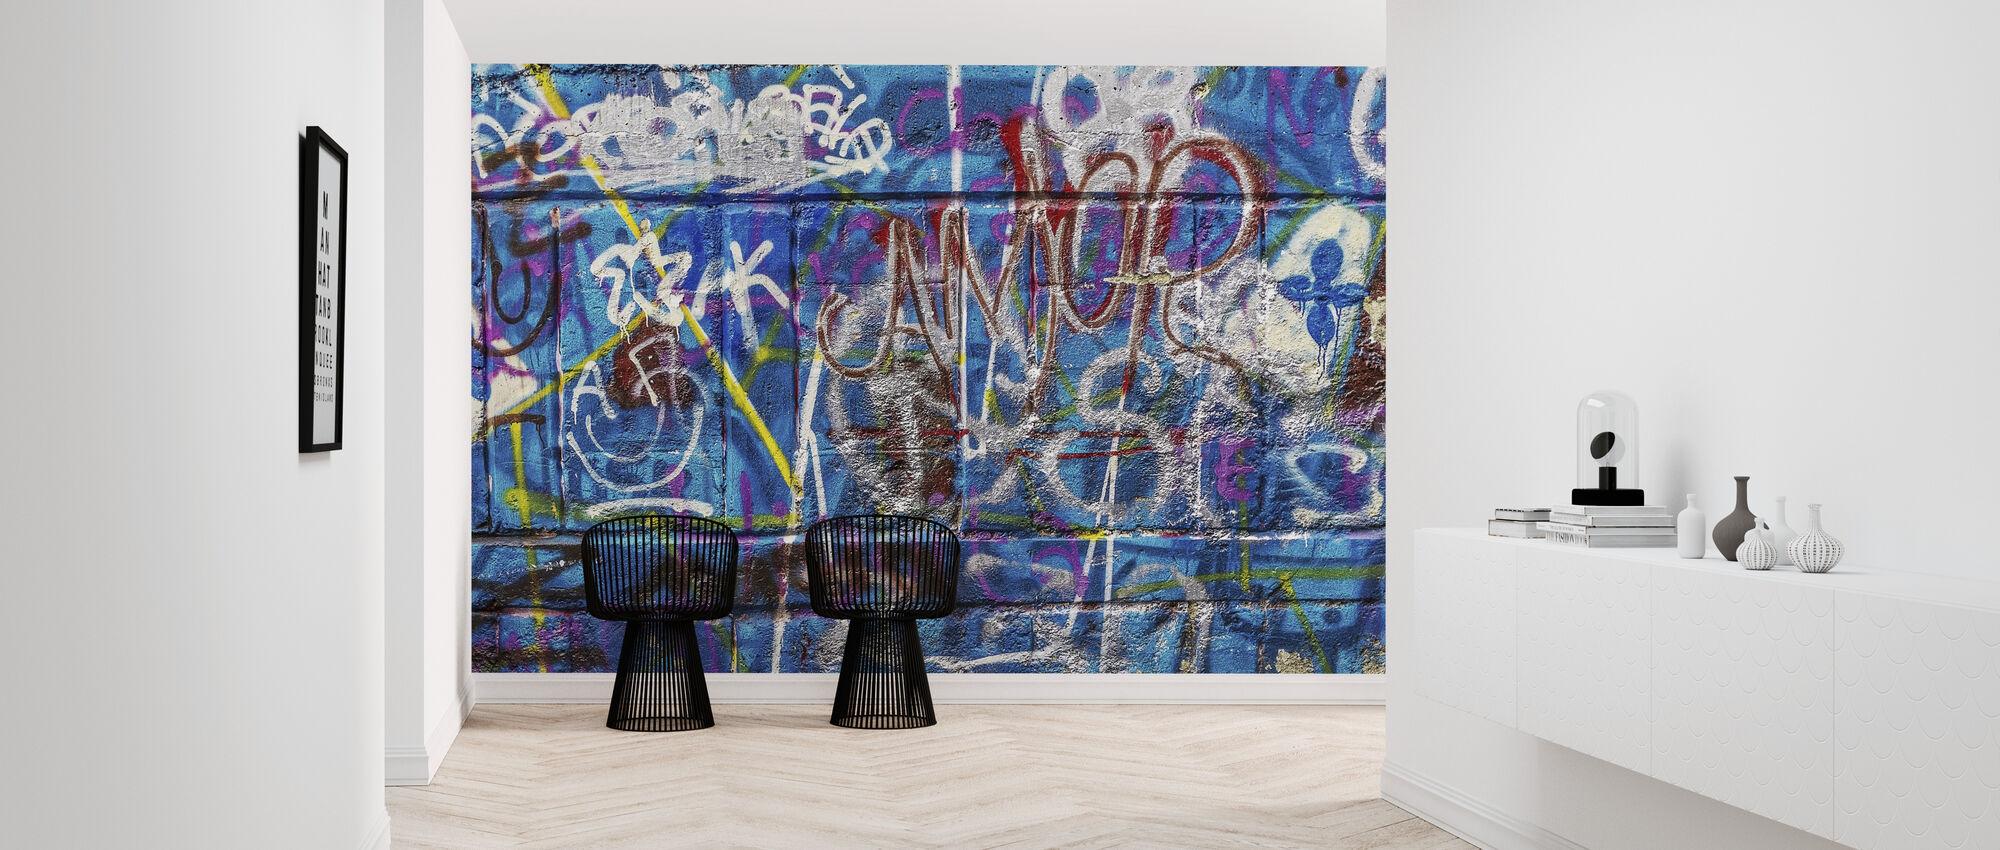 Wall Street Art - Tapetti - Aula